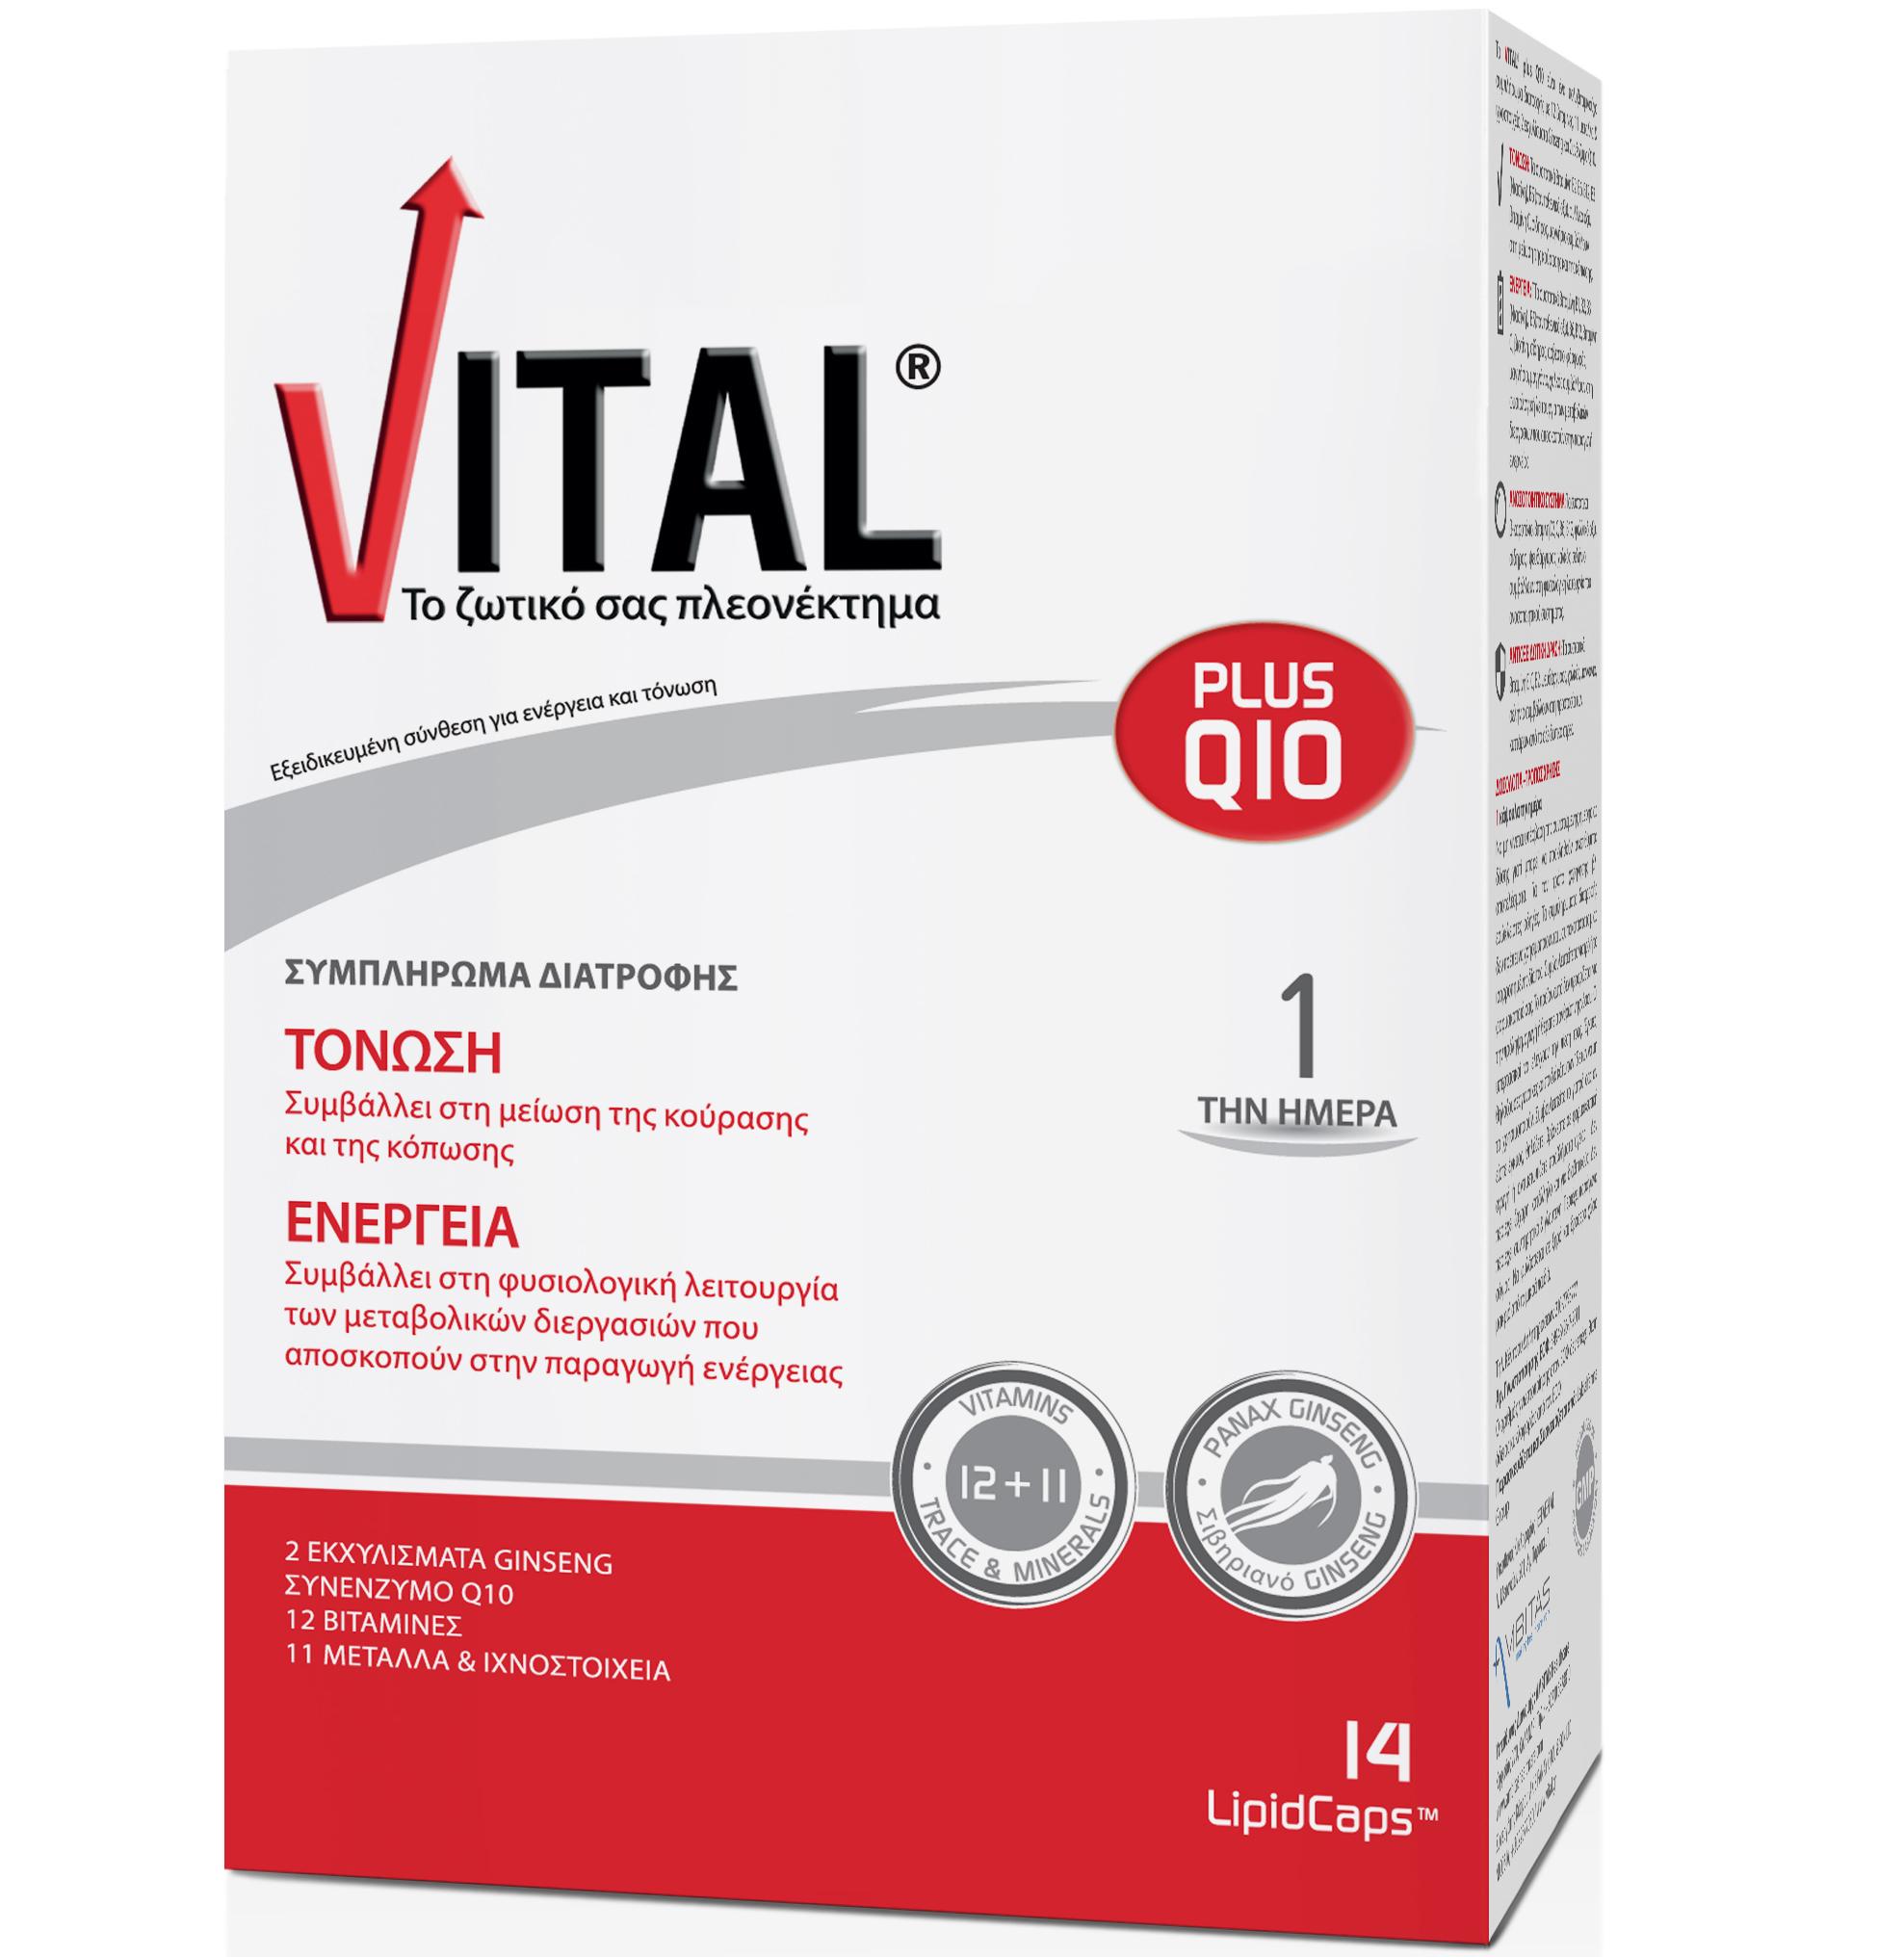 Vital Plus Q10 Συμπλήρωμα Διατροφής για Καθημερινή Ενέργεια & Τόνωση σε Κάψουλες – 14 caps